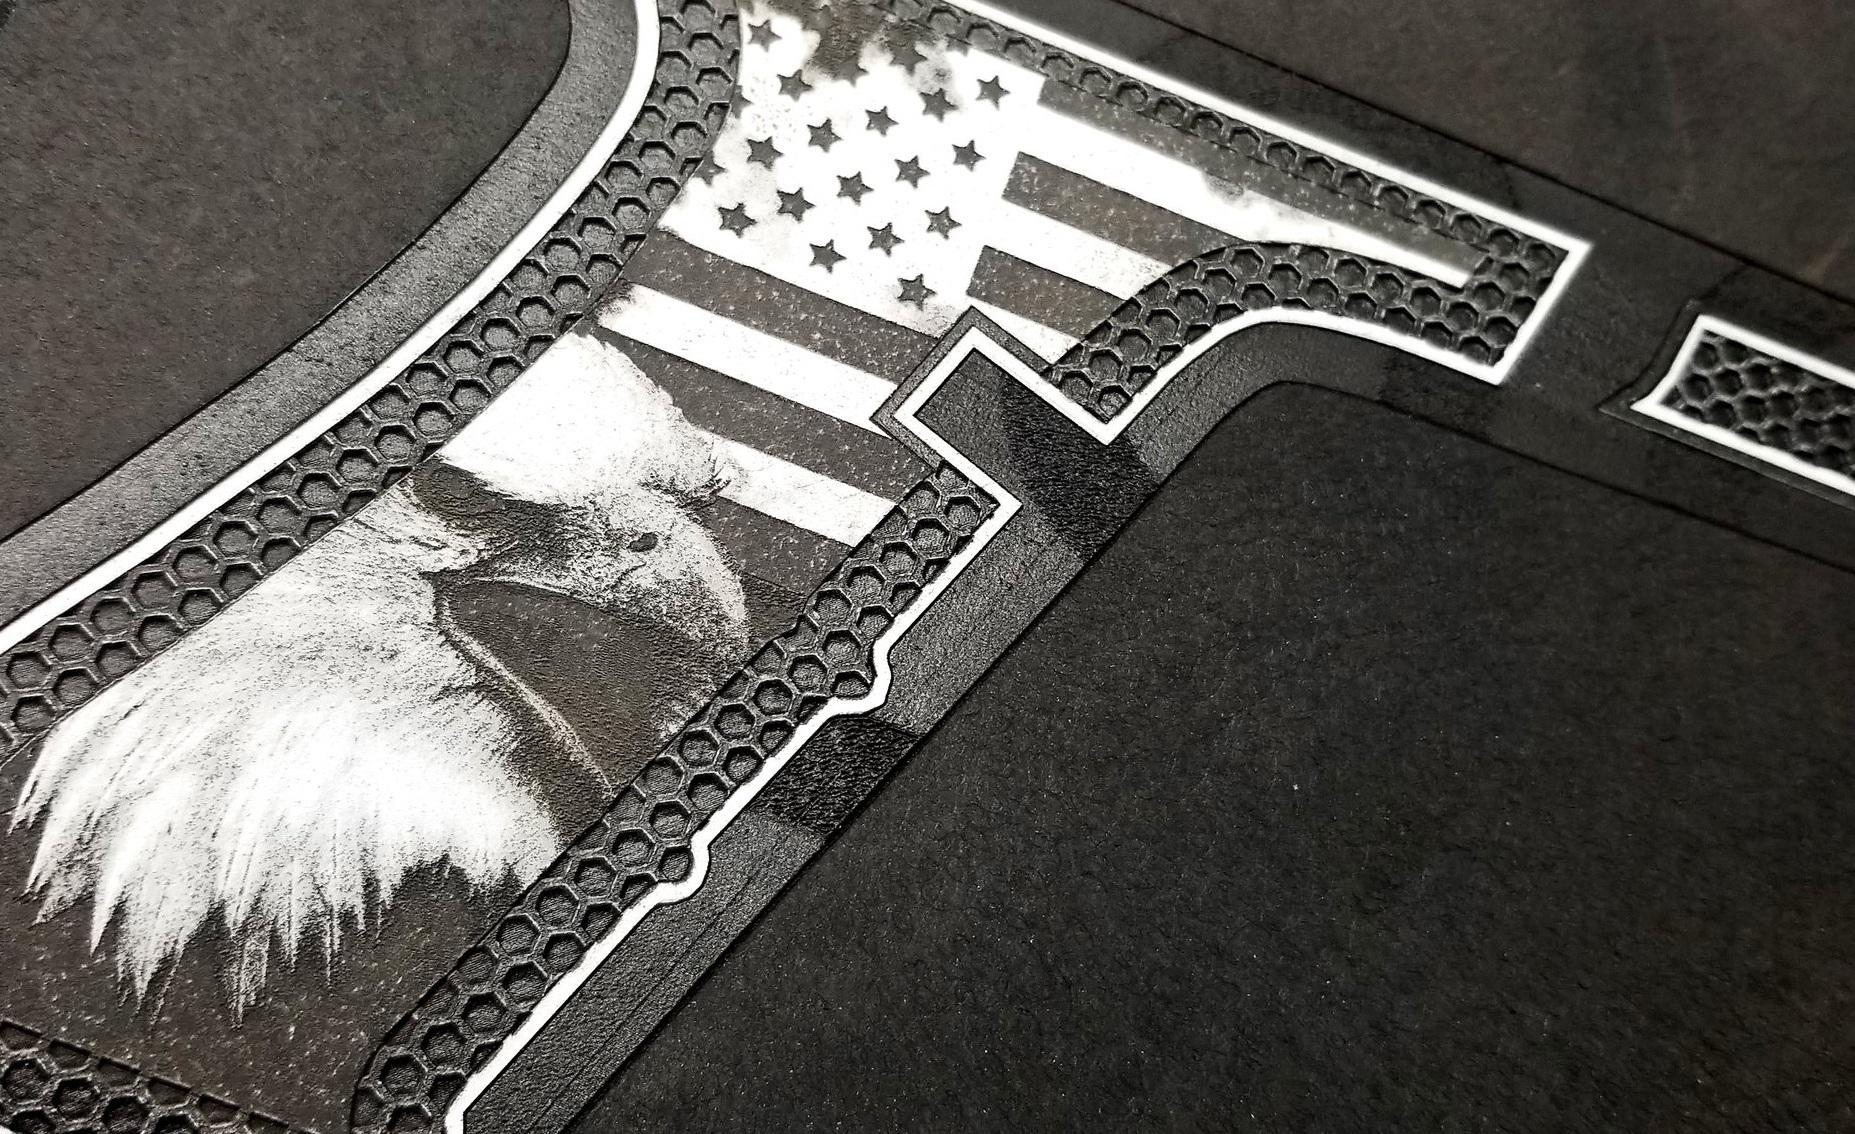 Photo-realistic pistol grip engraving - photo quality firearm engraving - high res firearm engraving - Engrave It Houston